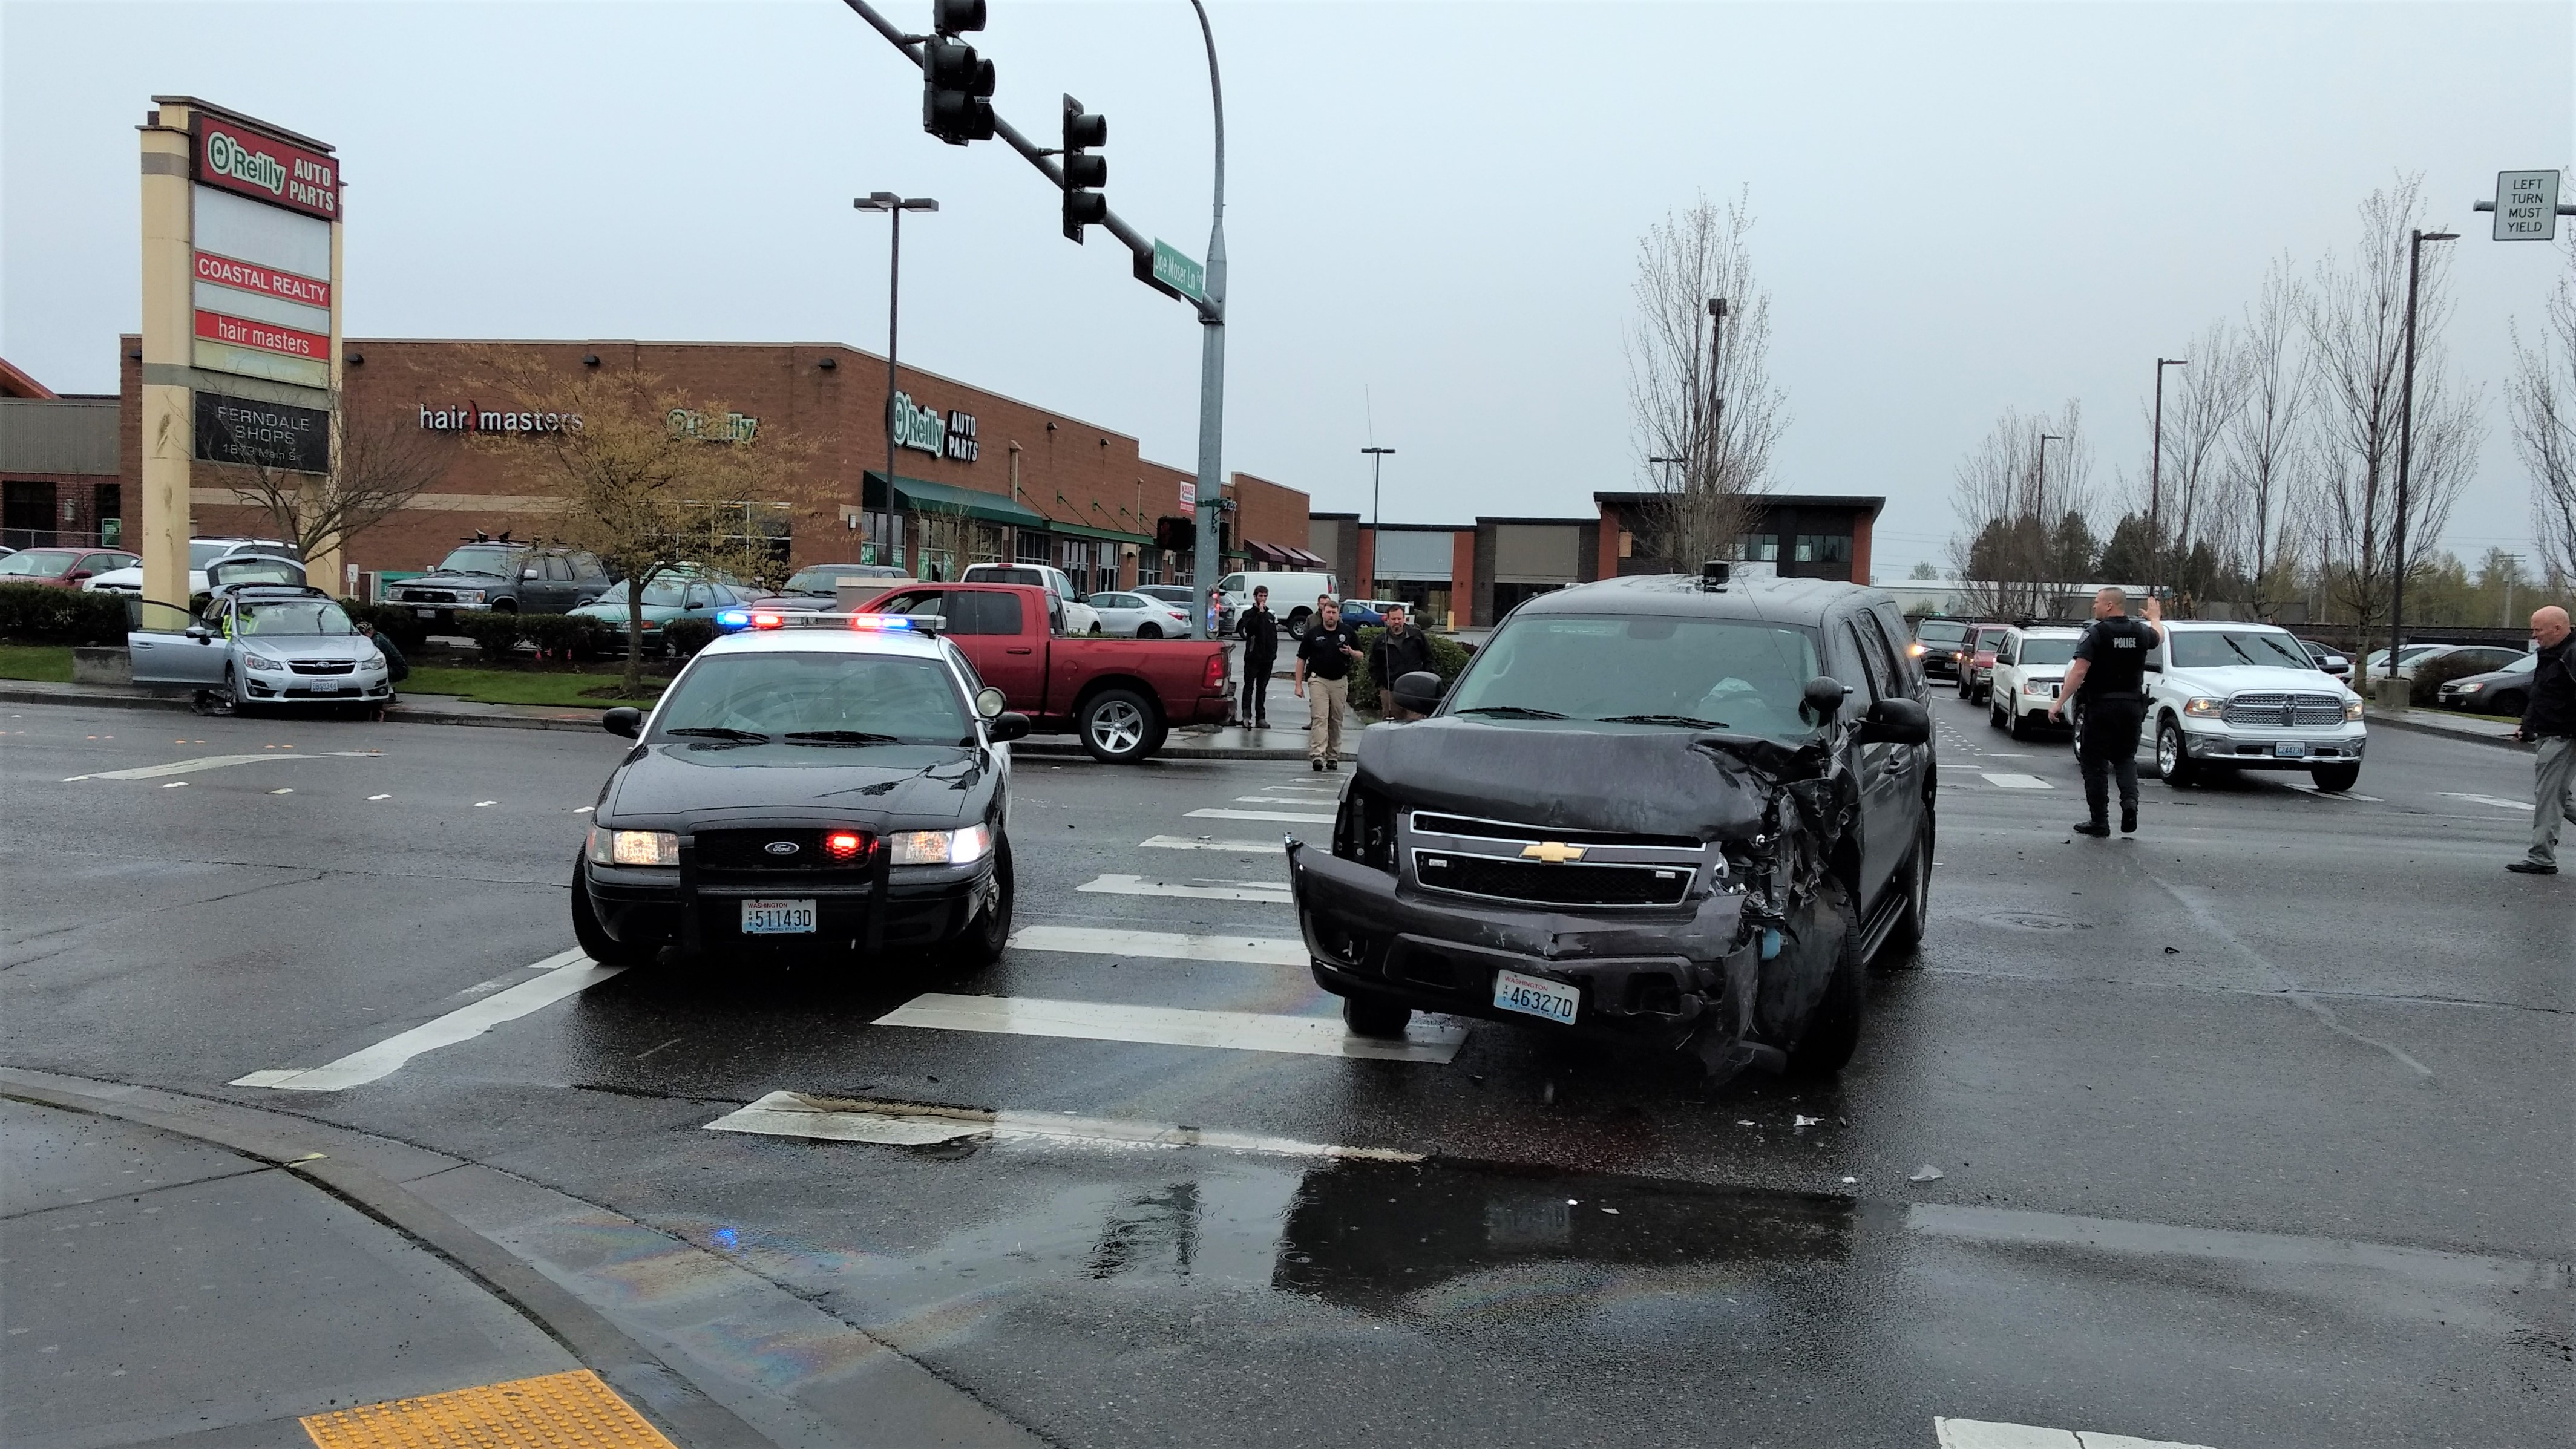 Scene of a police-involved crash on Main Street (April 11, 2019). Photo: My Ferndale News